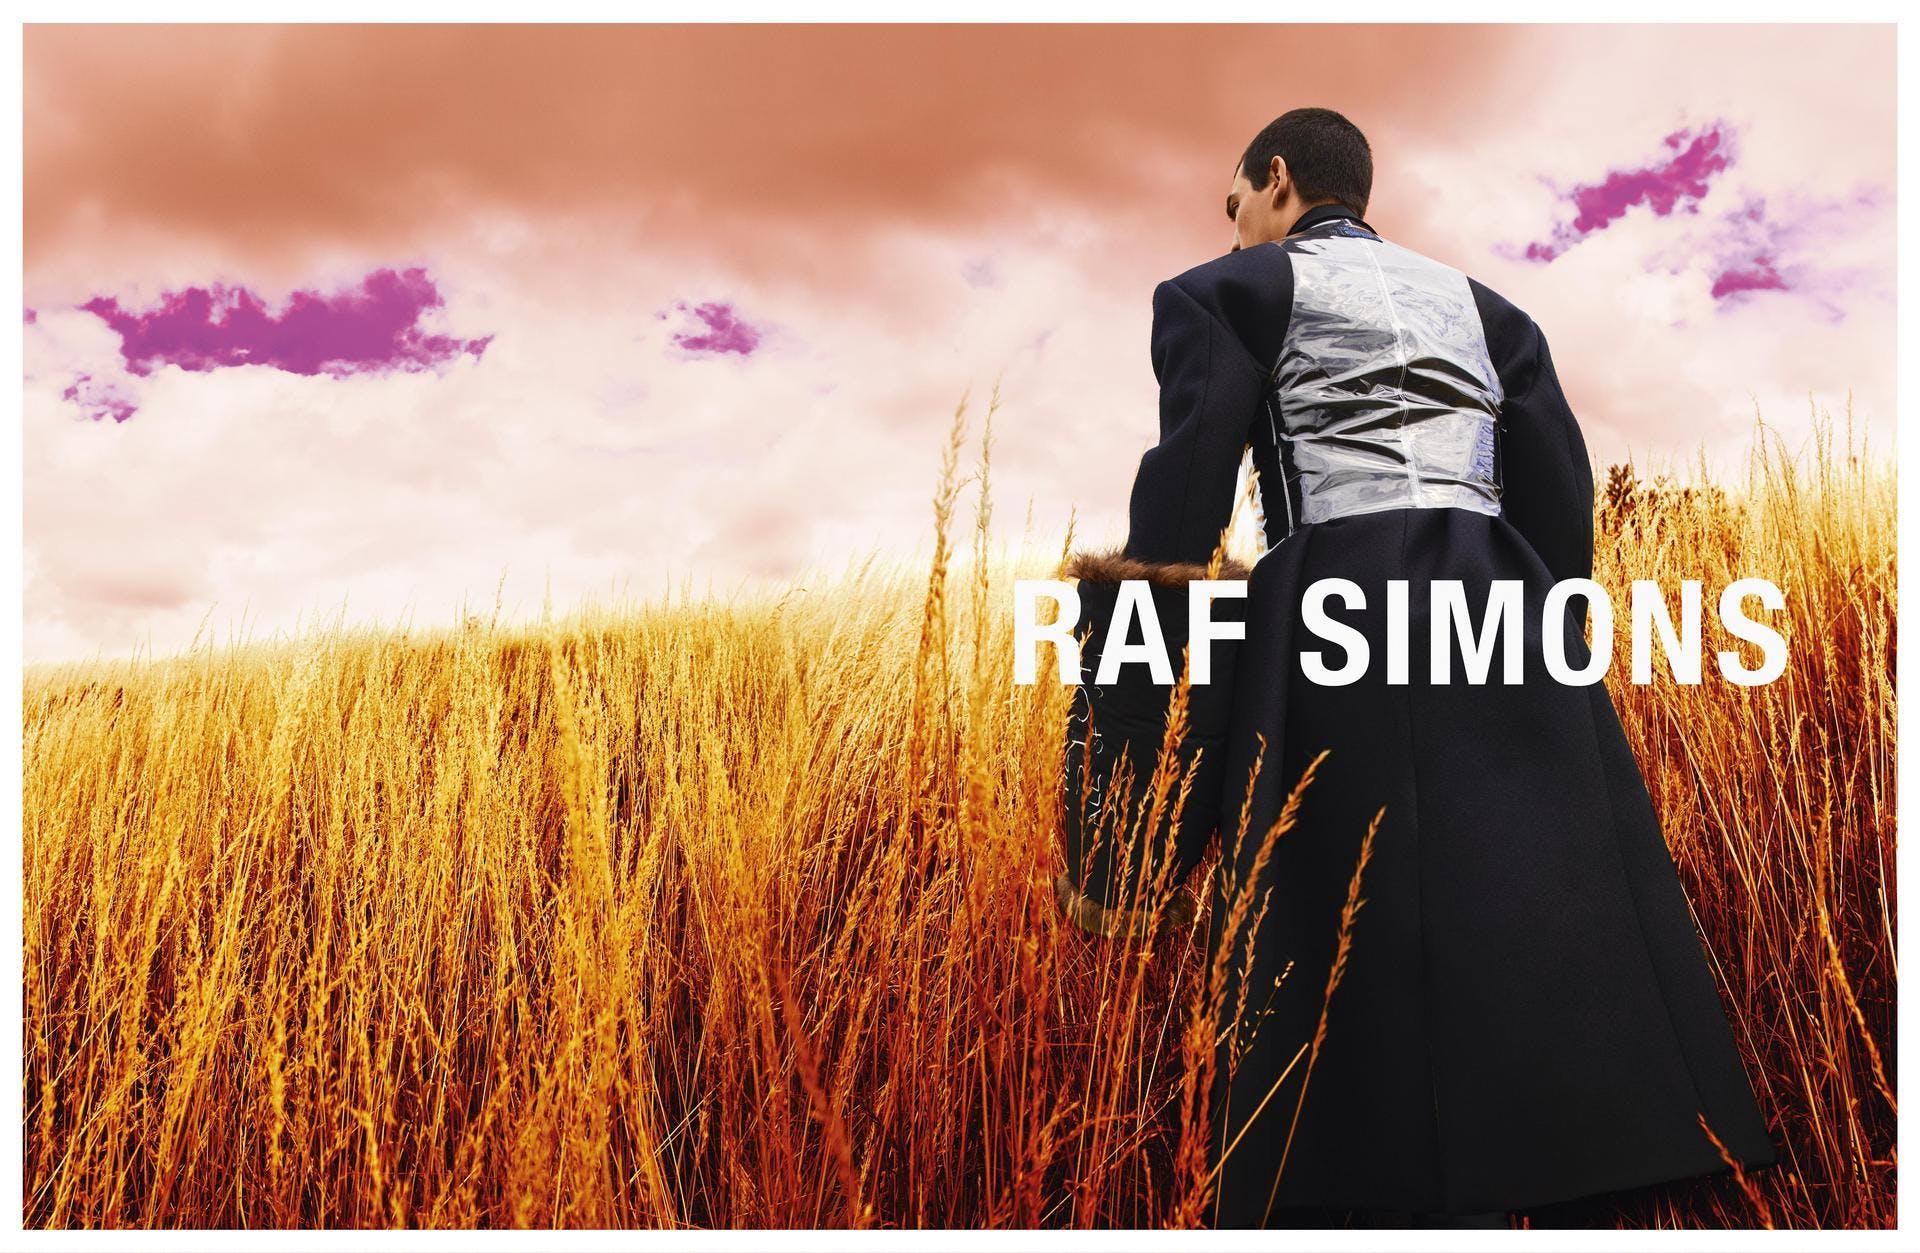 Raf Simons Fall 2020 Ad Campaign.